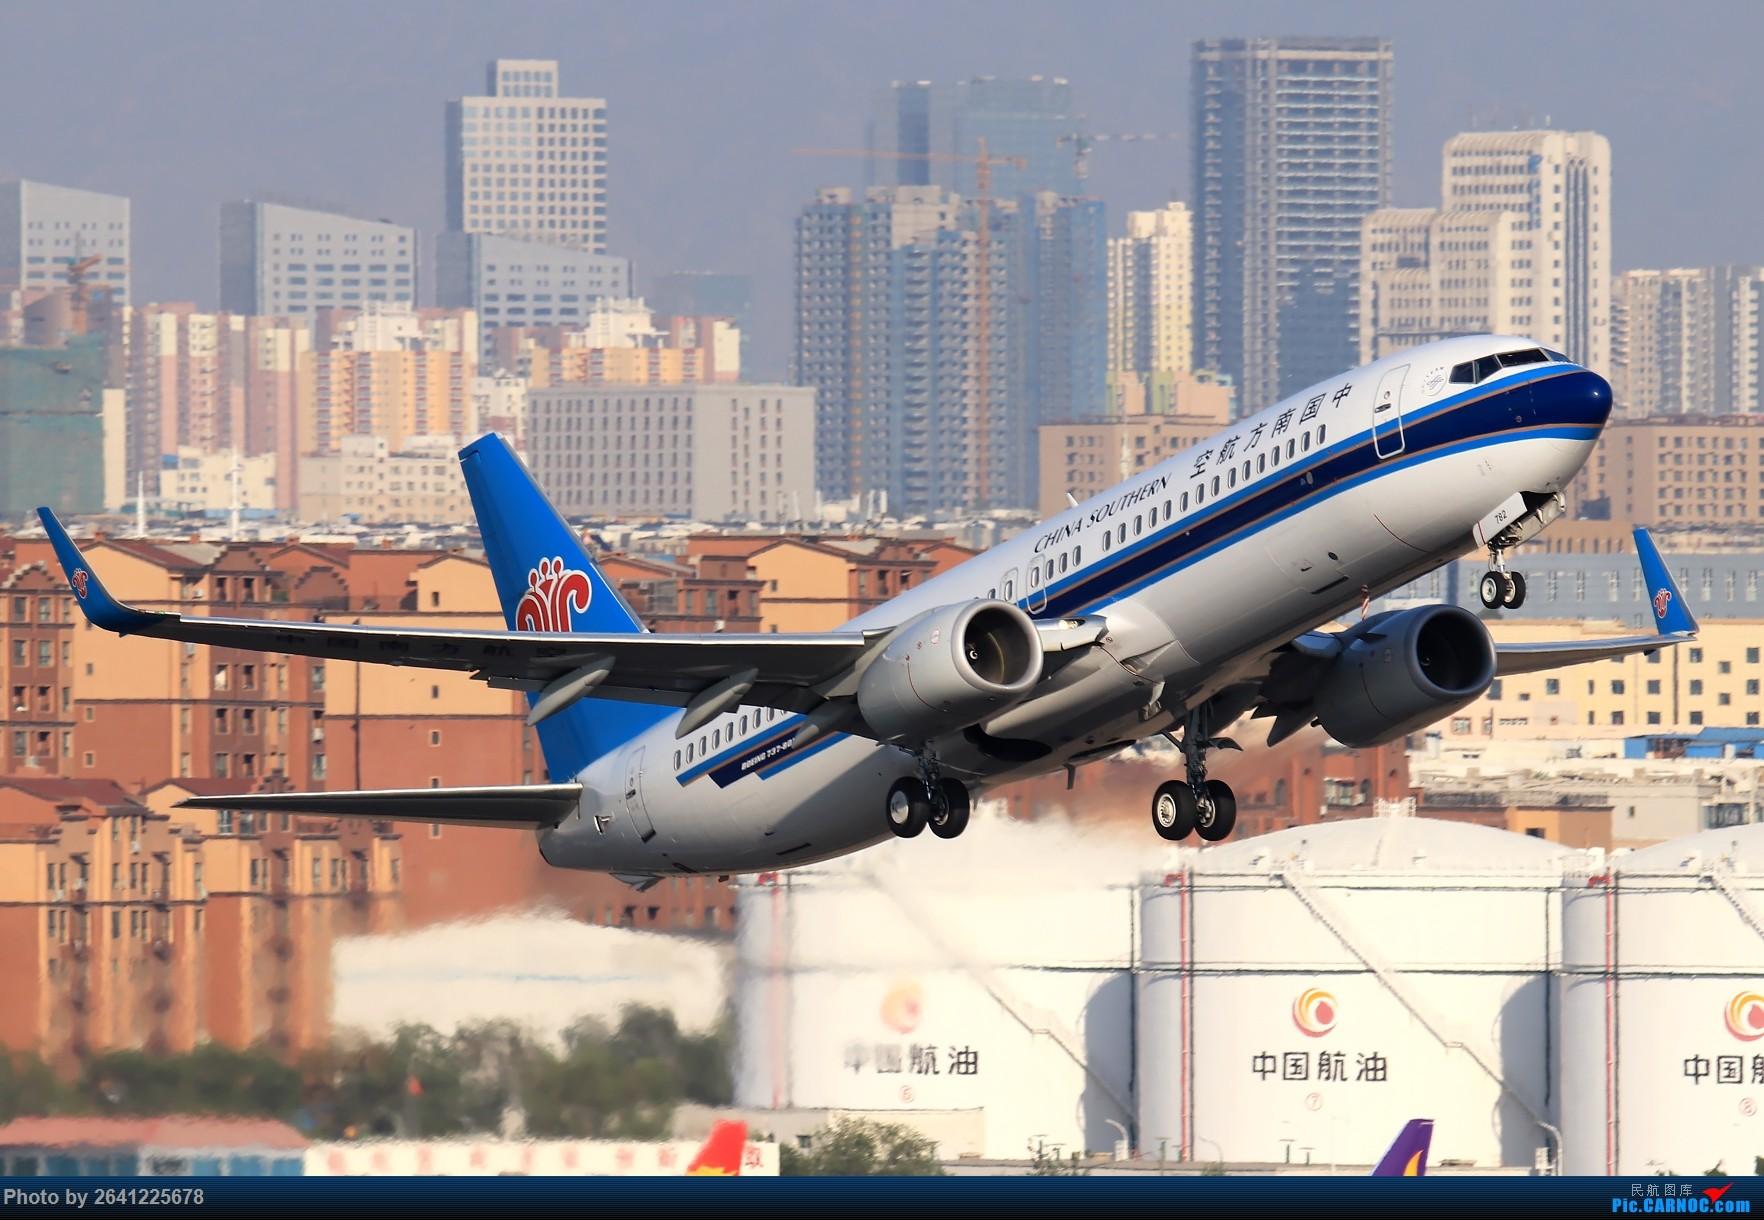 Re:[原创]【小周游记第7集拍机贴】乌鲁木齐绝美的地景和光线 BOEING 737-800 B-1782 中国乌鲁木齐地窝堡国际机场